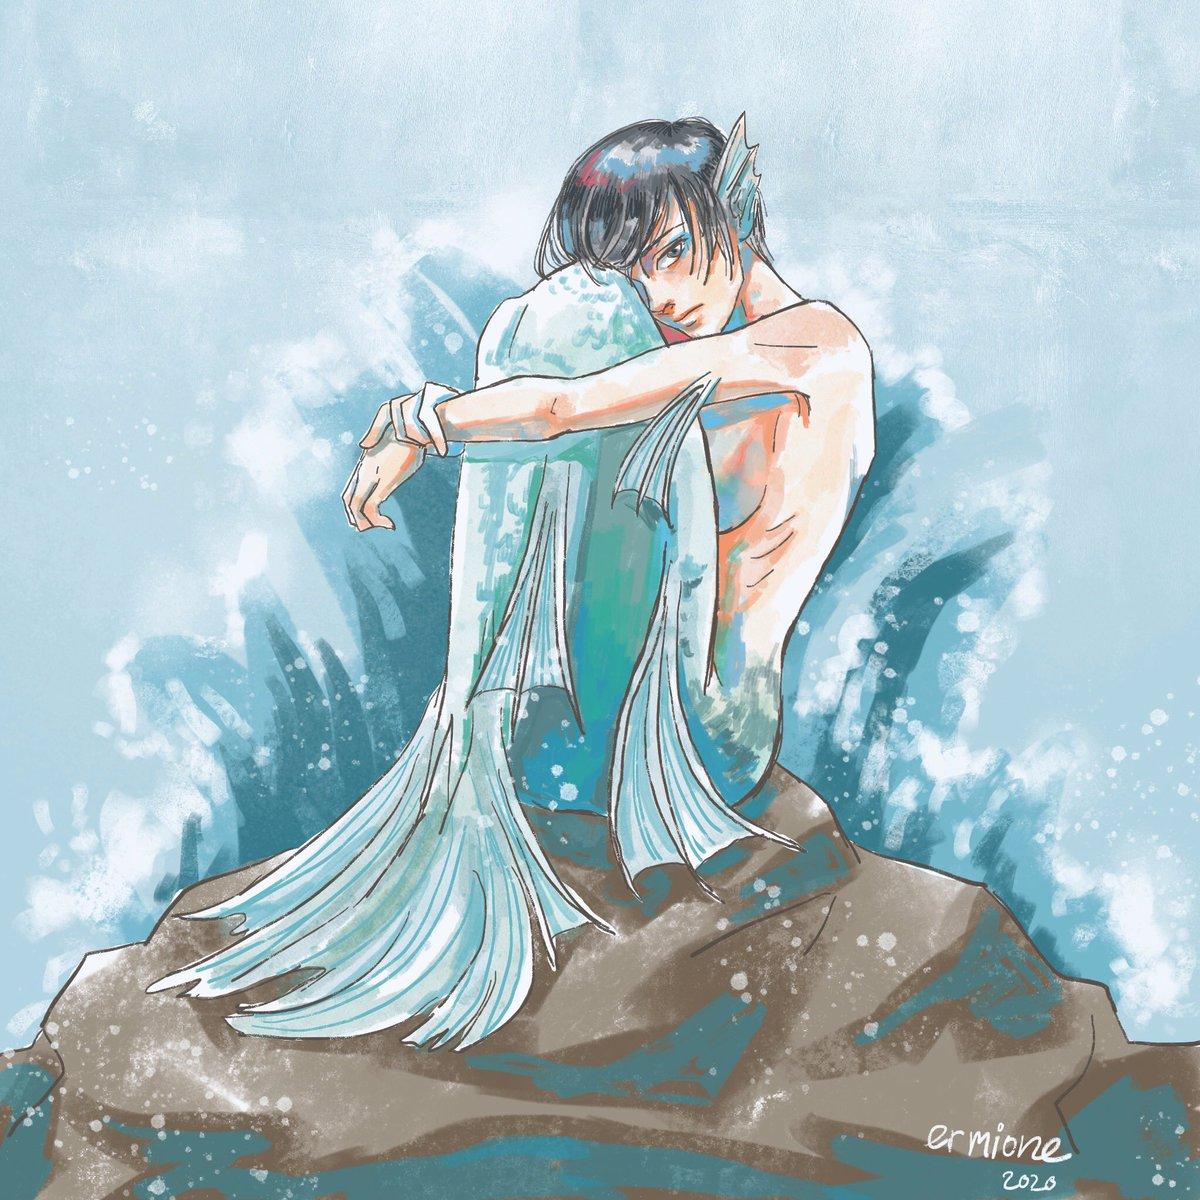 #AOTweeklyTh week12 'mermaid'  #mikasa #ermioneart #ミカサ<br>http://pic.twitter.com/BsvvTc6BOB